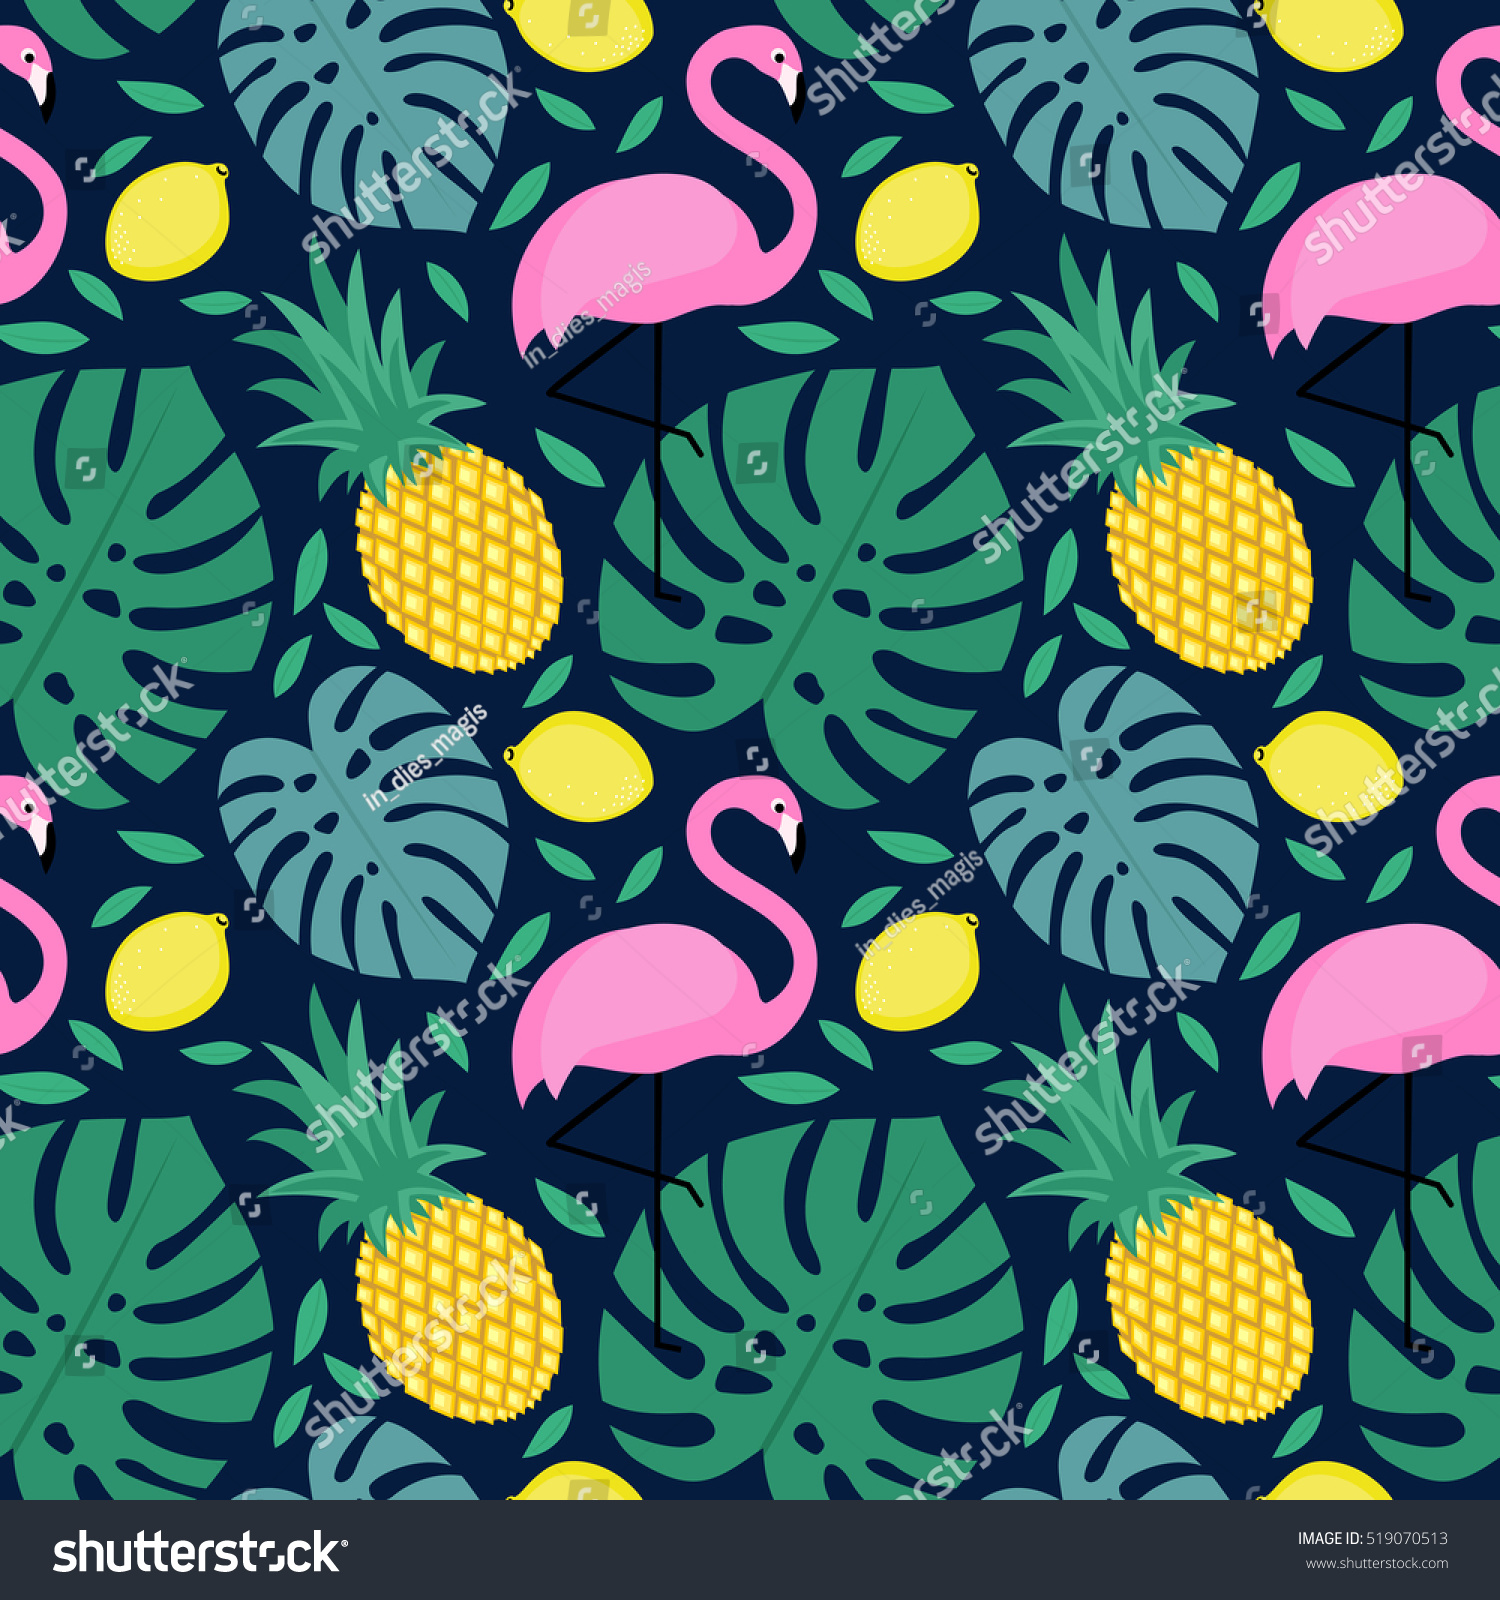 Pineapple Background Design - ma